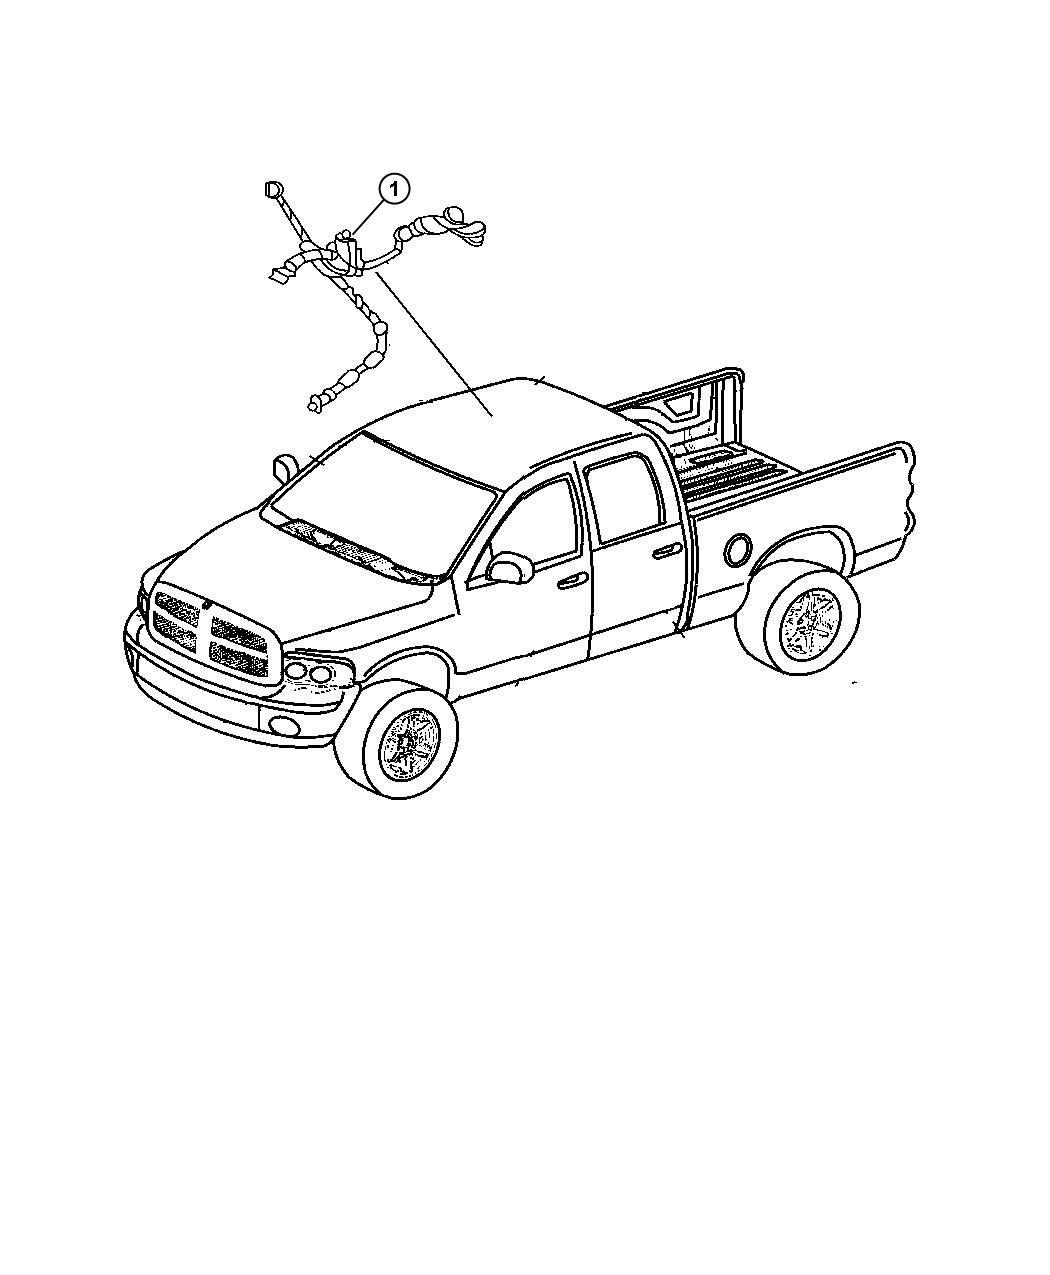 2013 dodge avenger wiring  overhead console  trim   all trim codes